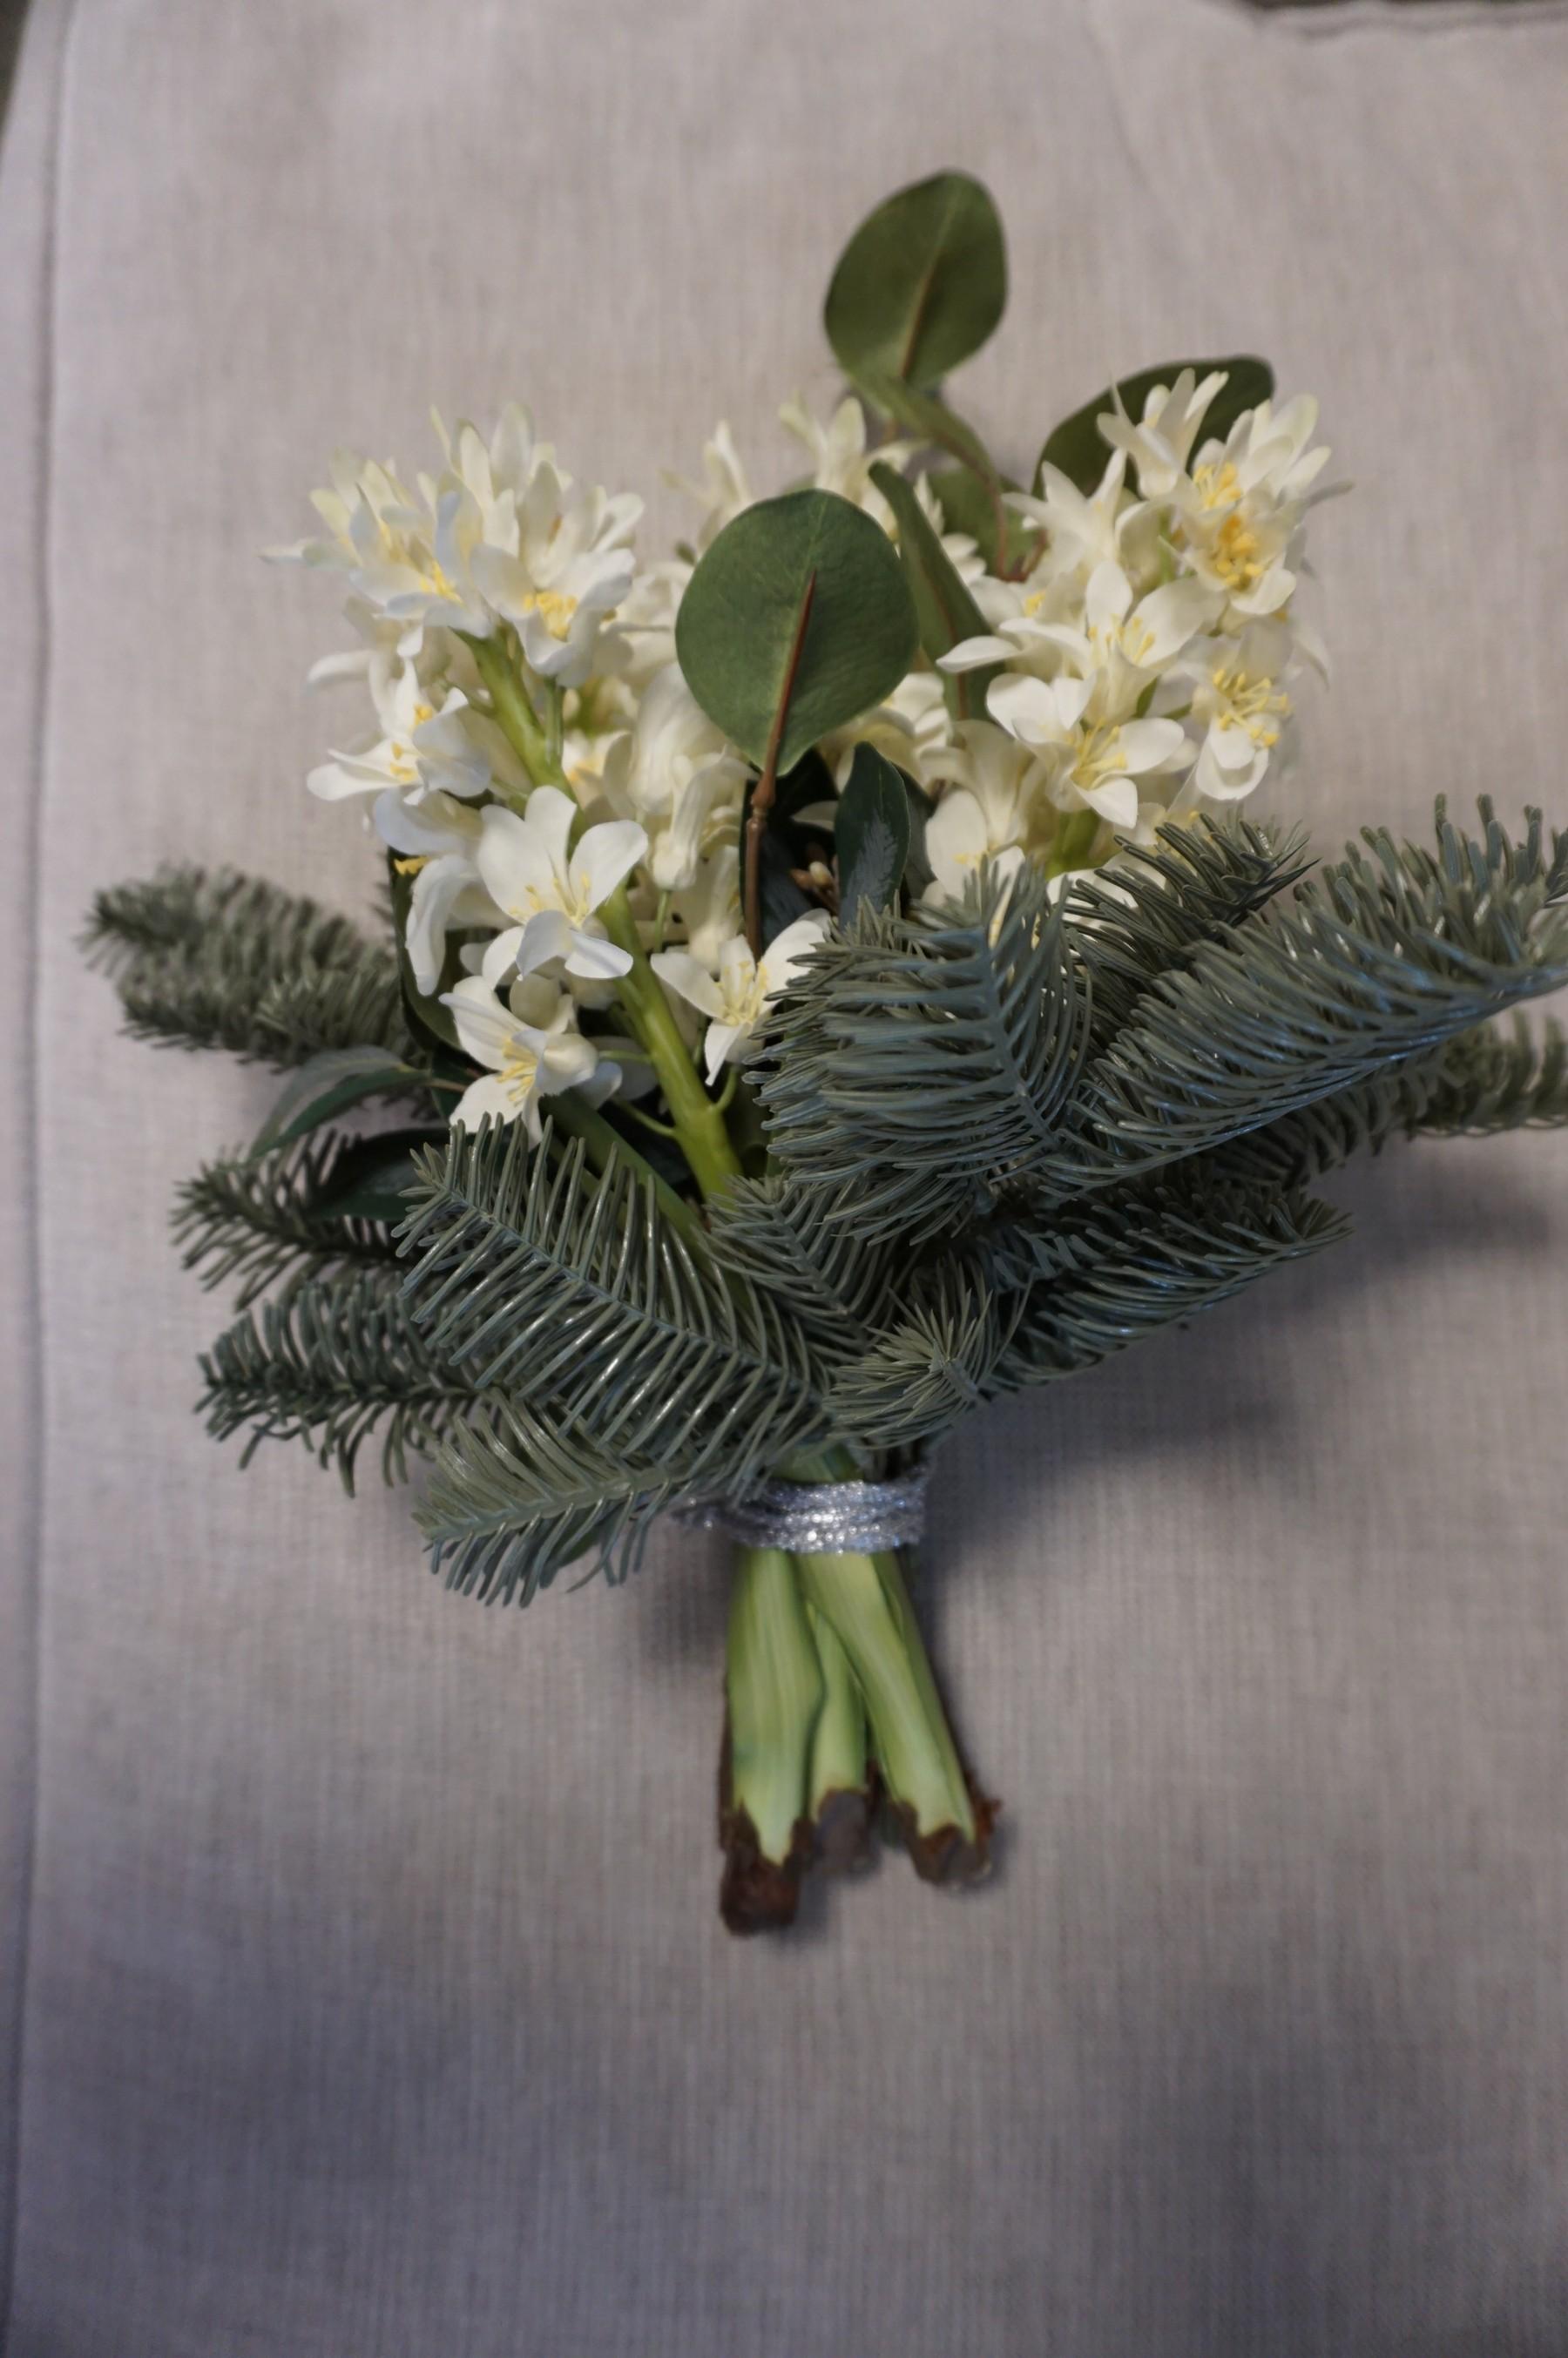 Silvergran, nobilis, konstgjord grankvist